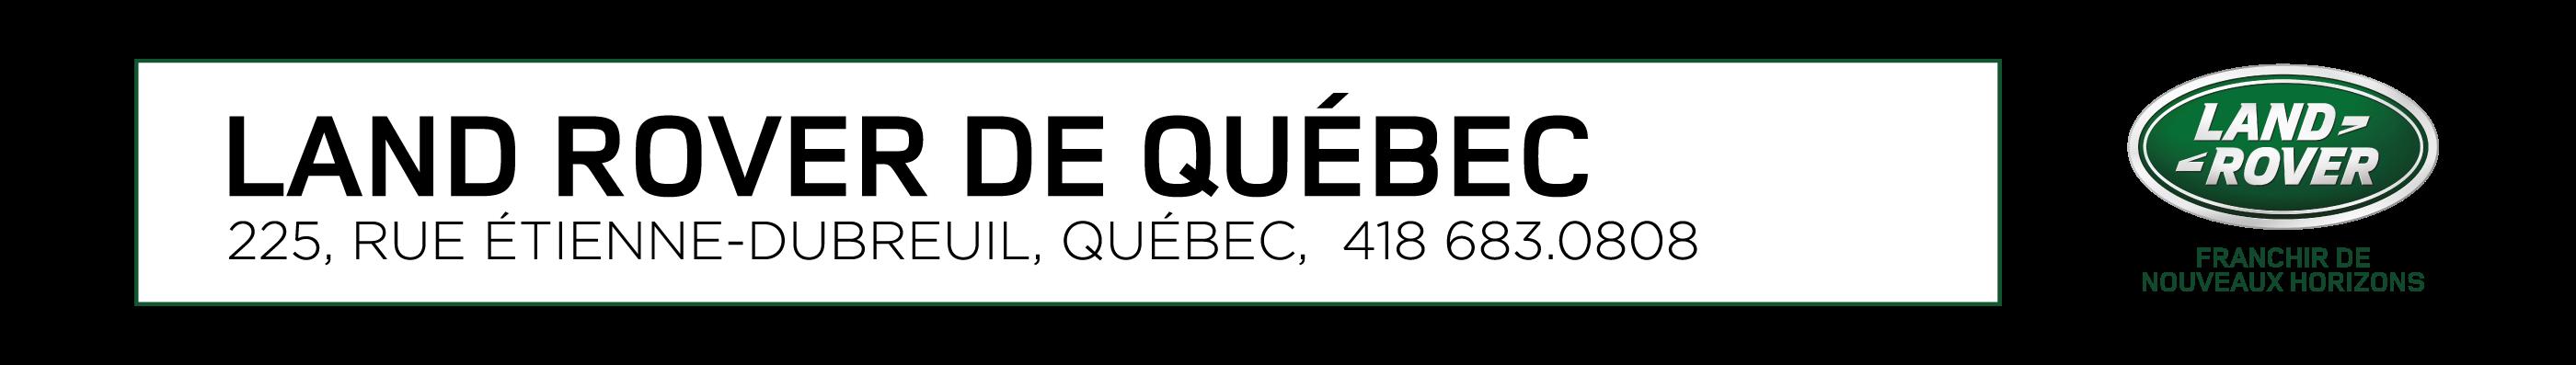 Logo-LR Quebec